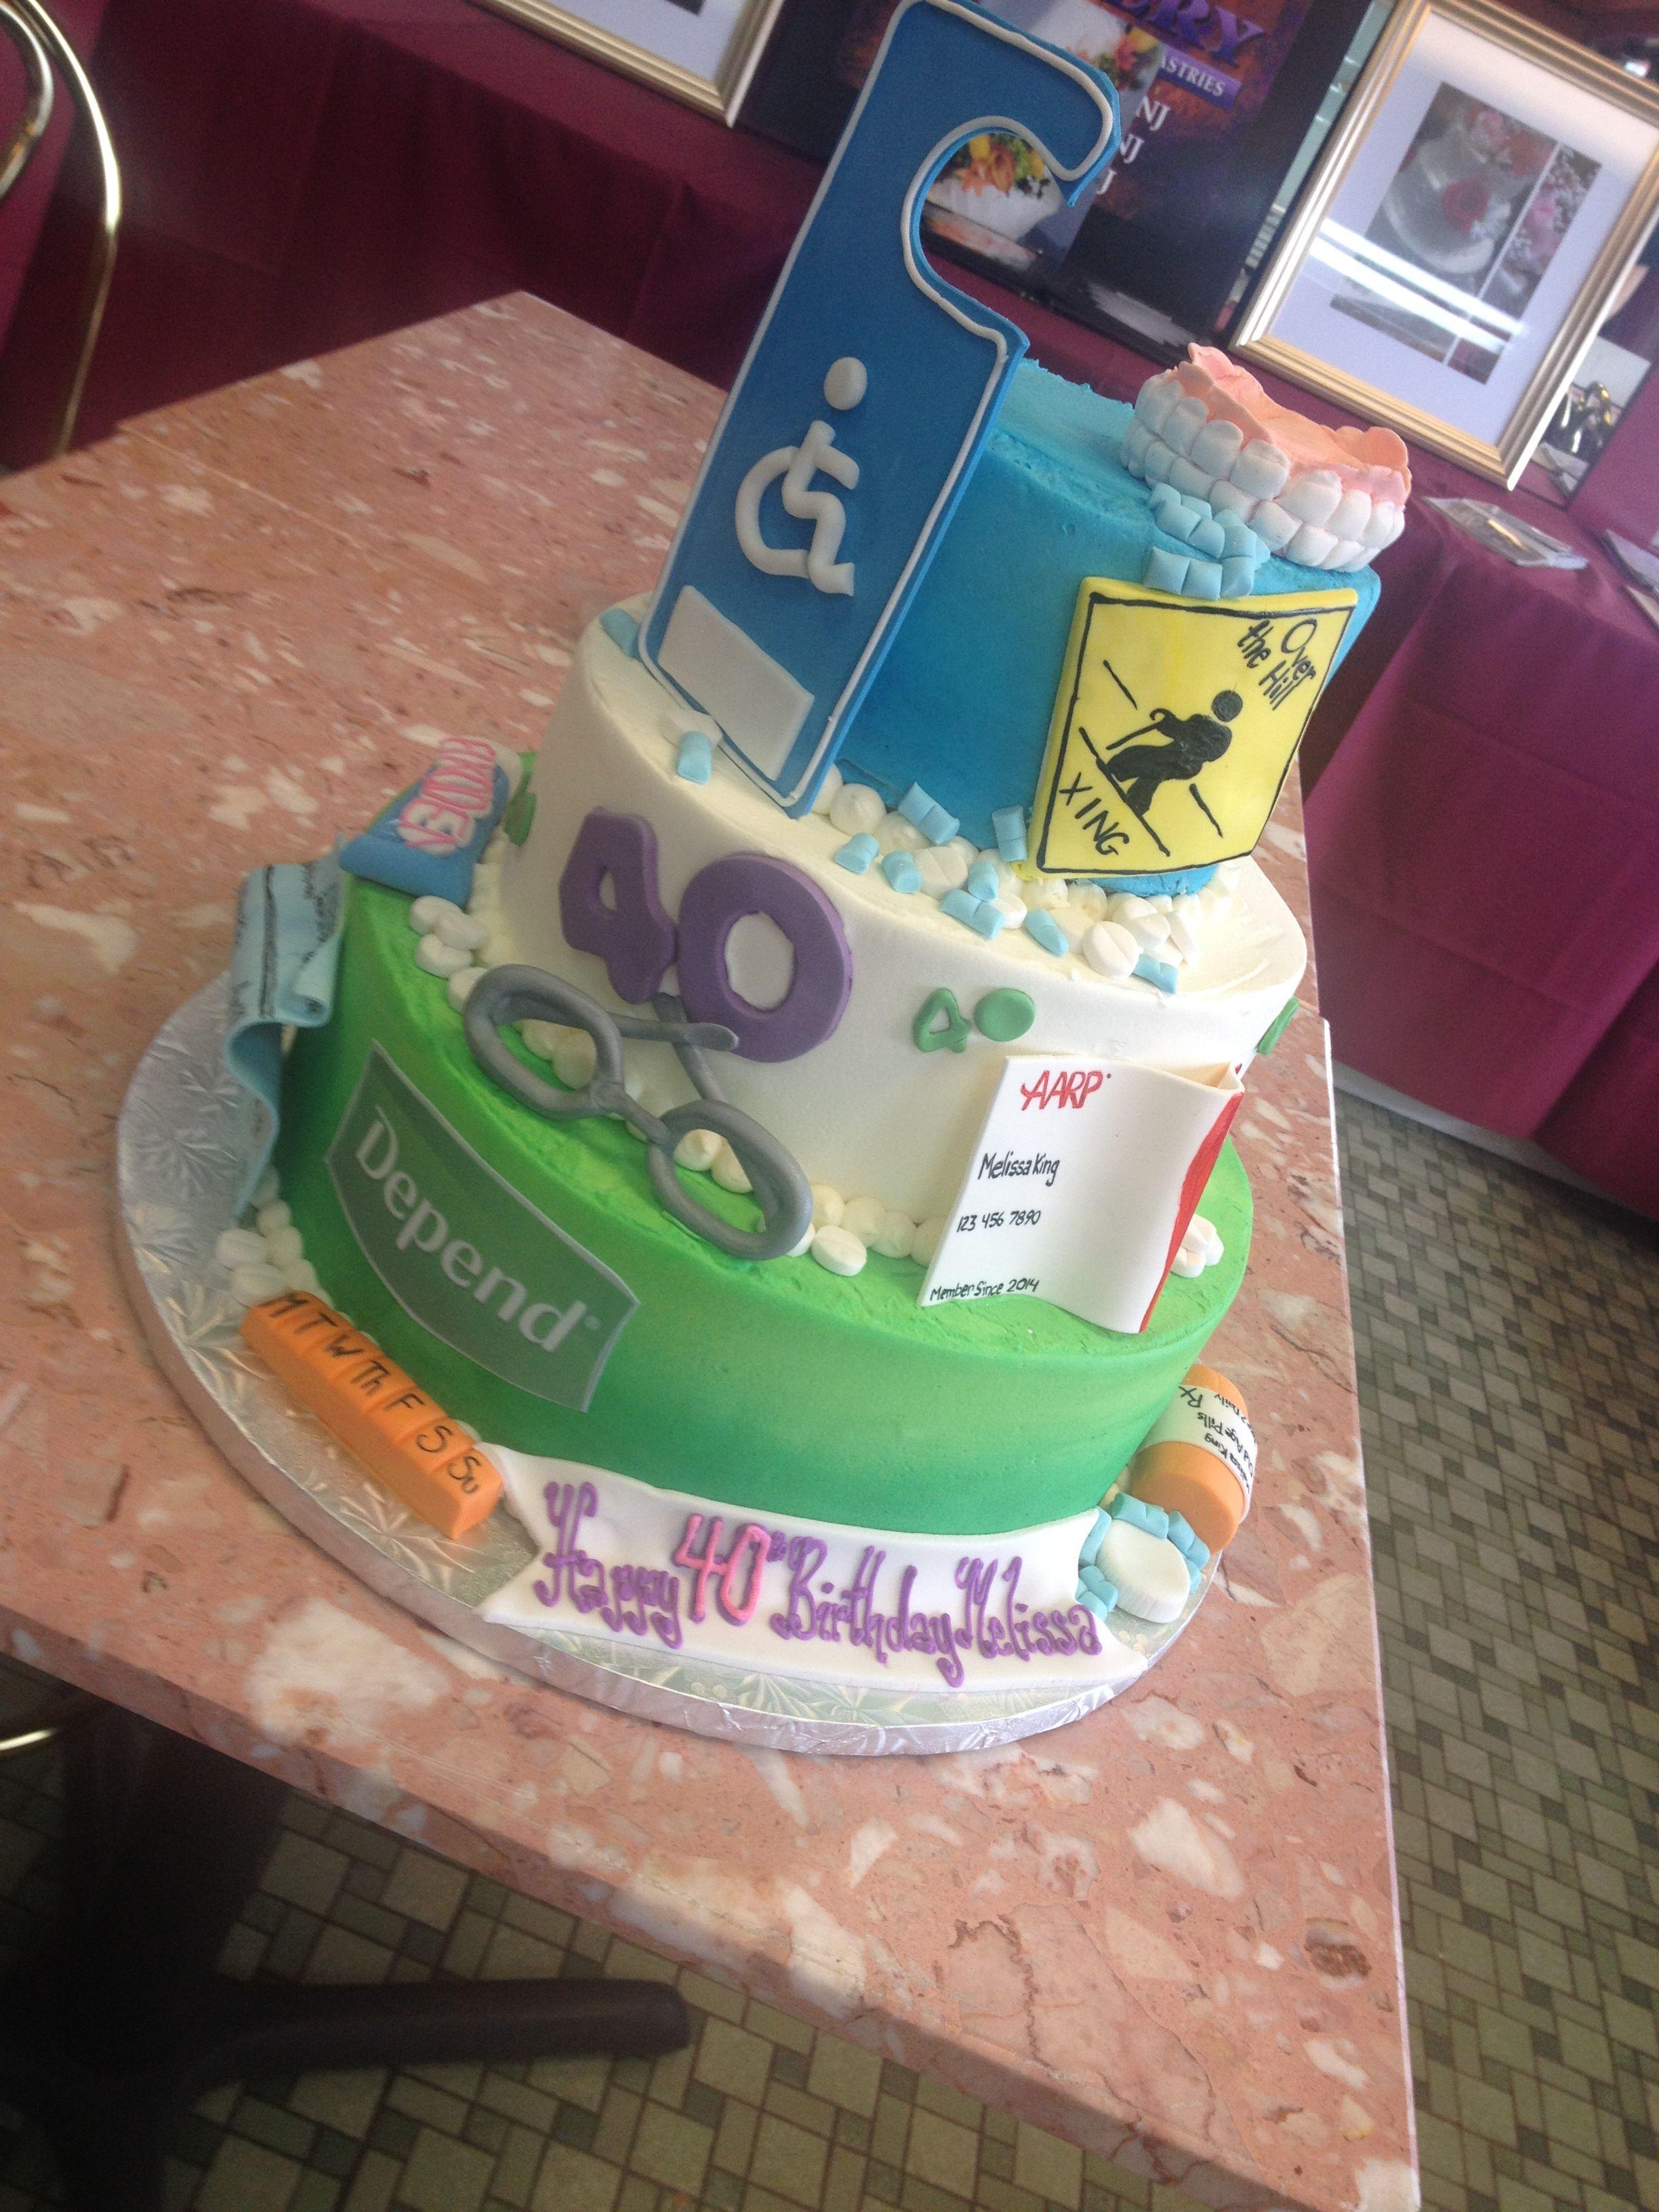 50 Years Old Year 21st Birthday Cakes Milestone Birthdays